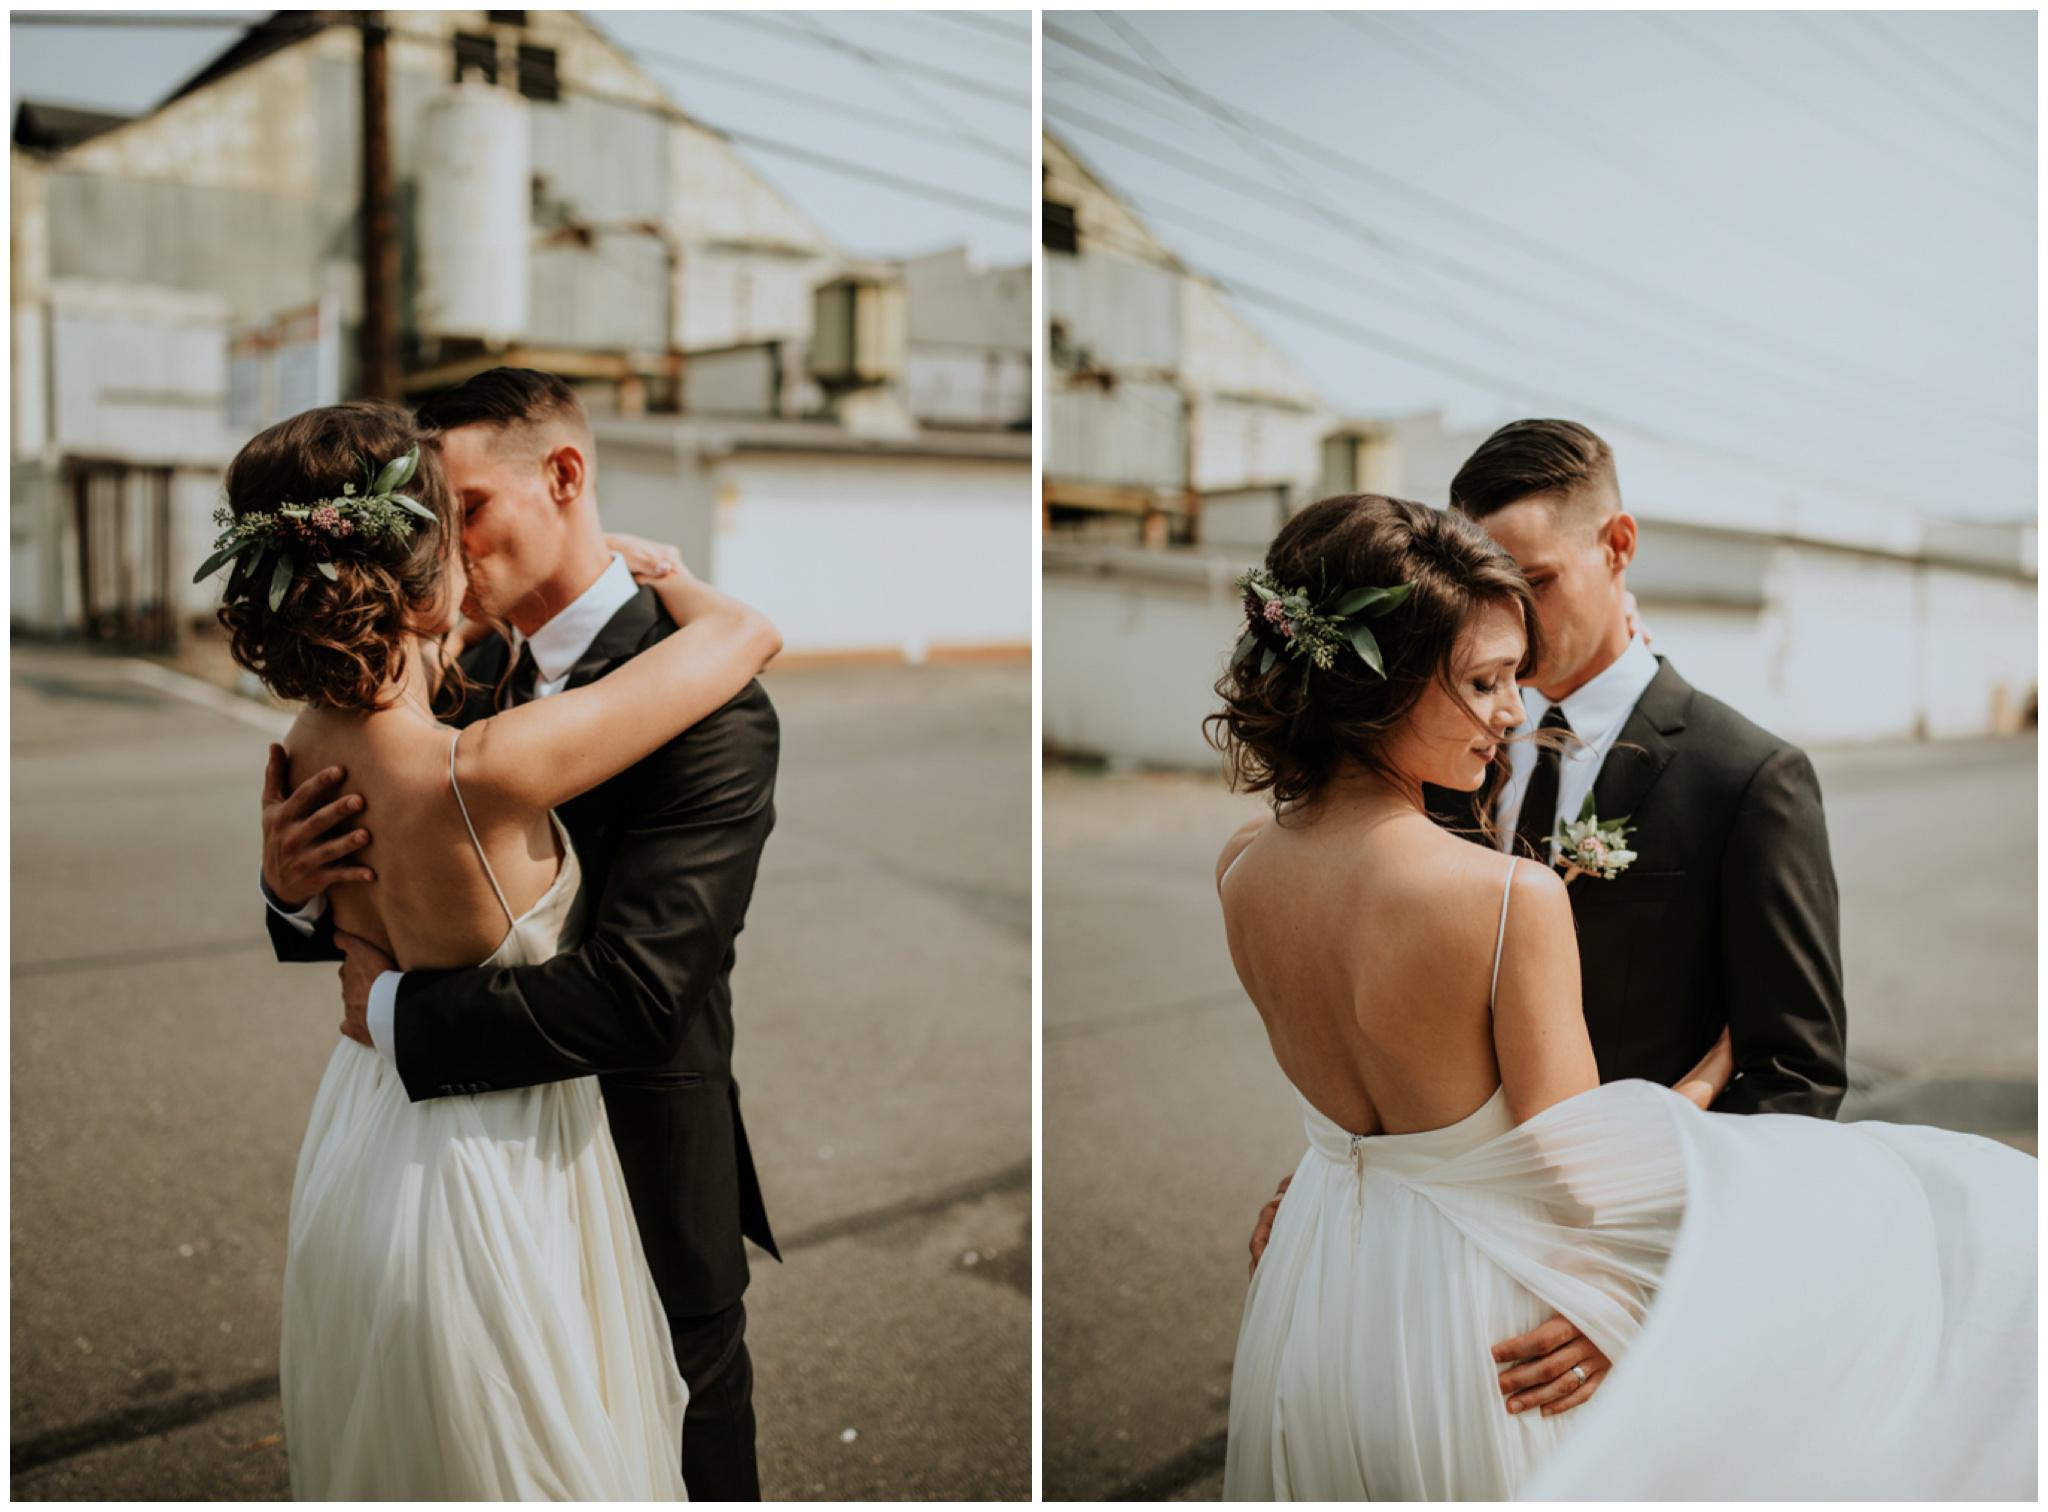 alyssa-keiran-westland-distillery-urban-seattle-wedding-photographer-caitlyn-nikula-68.jpg